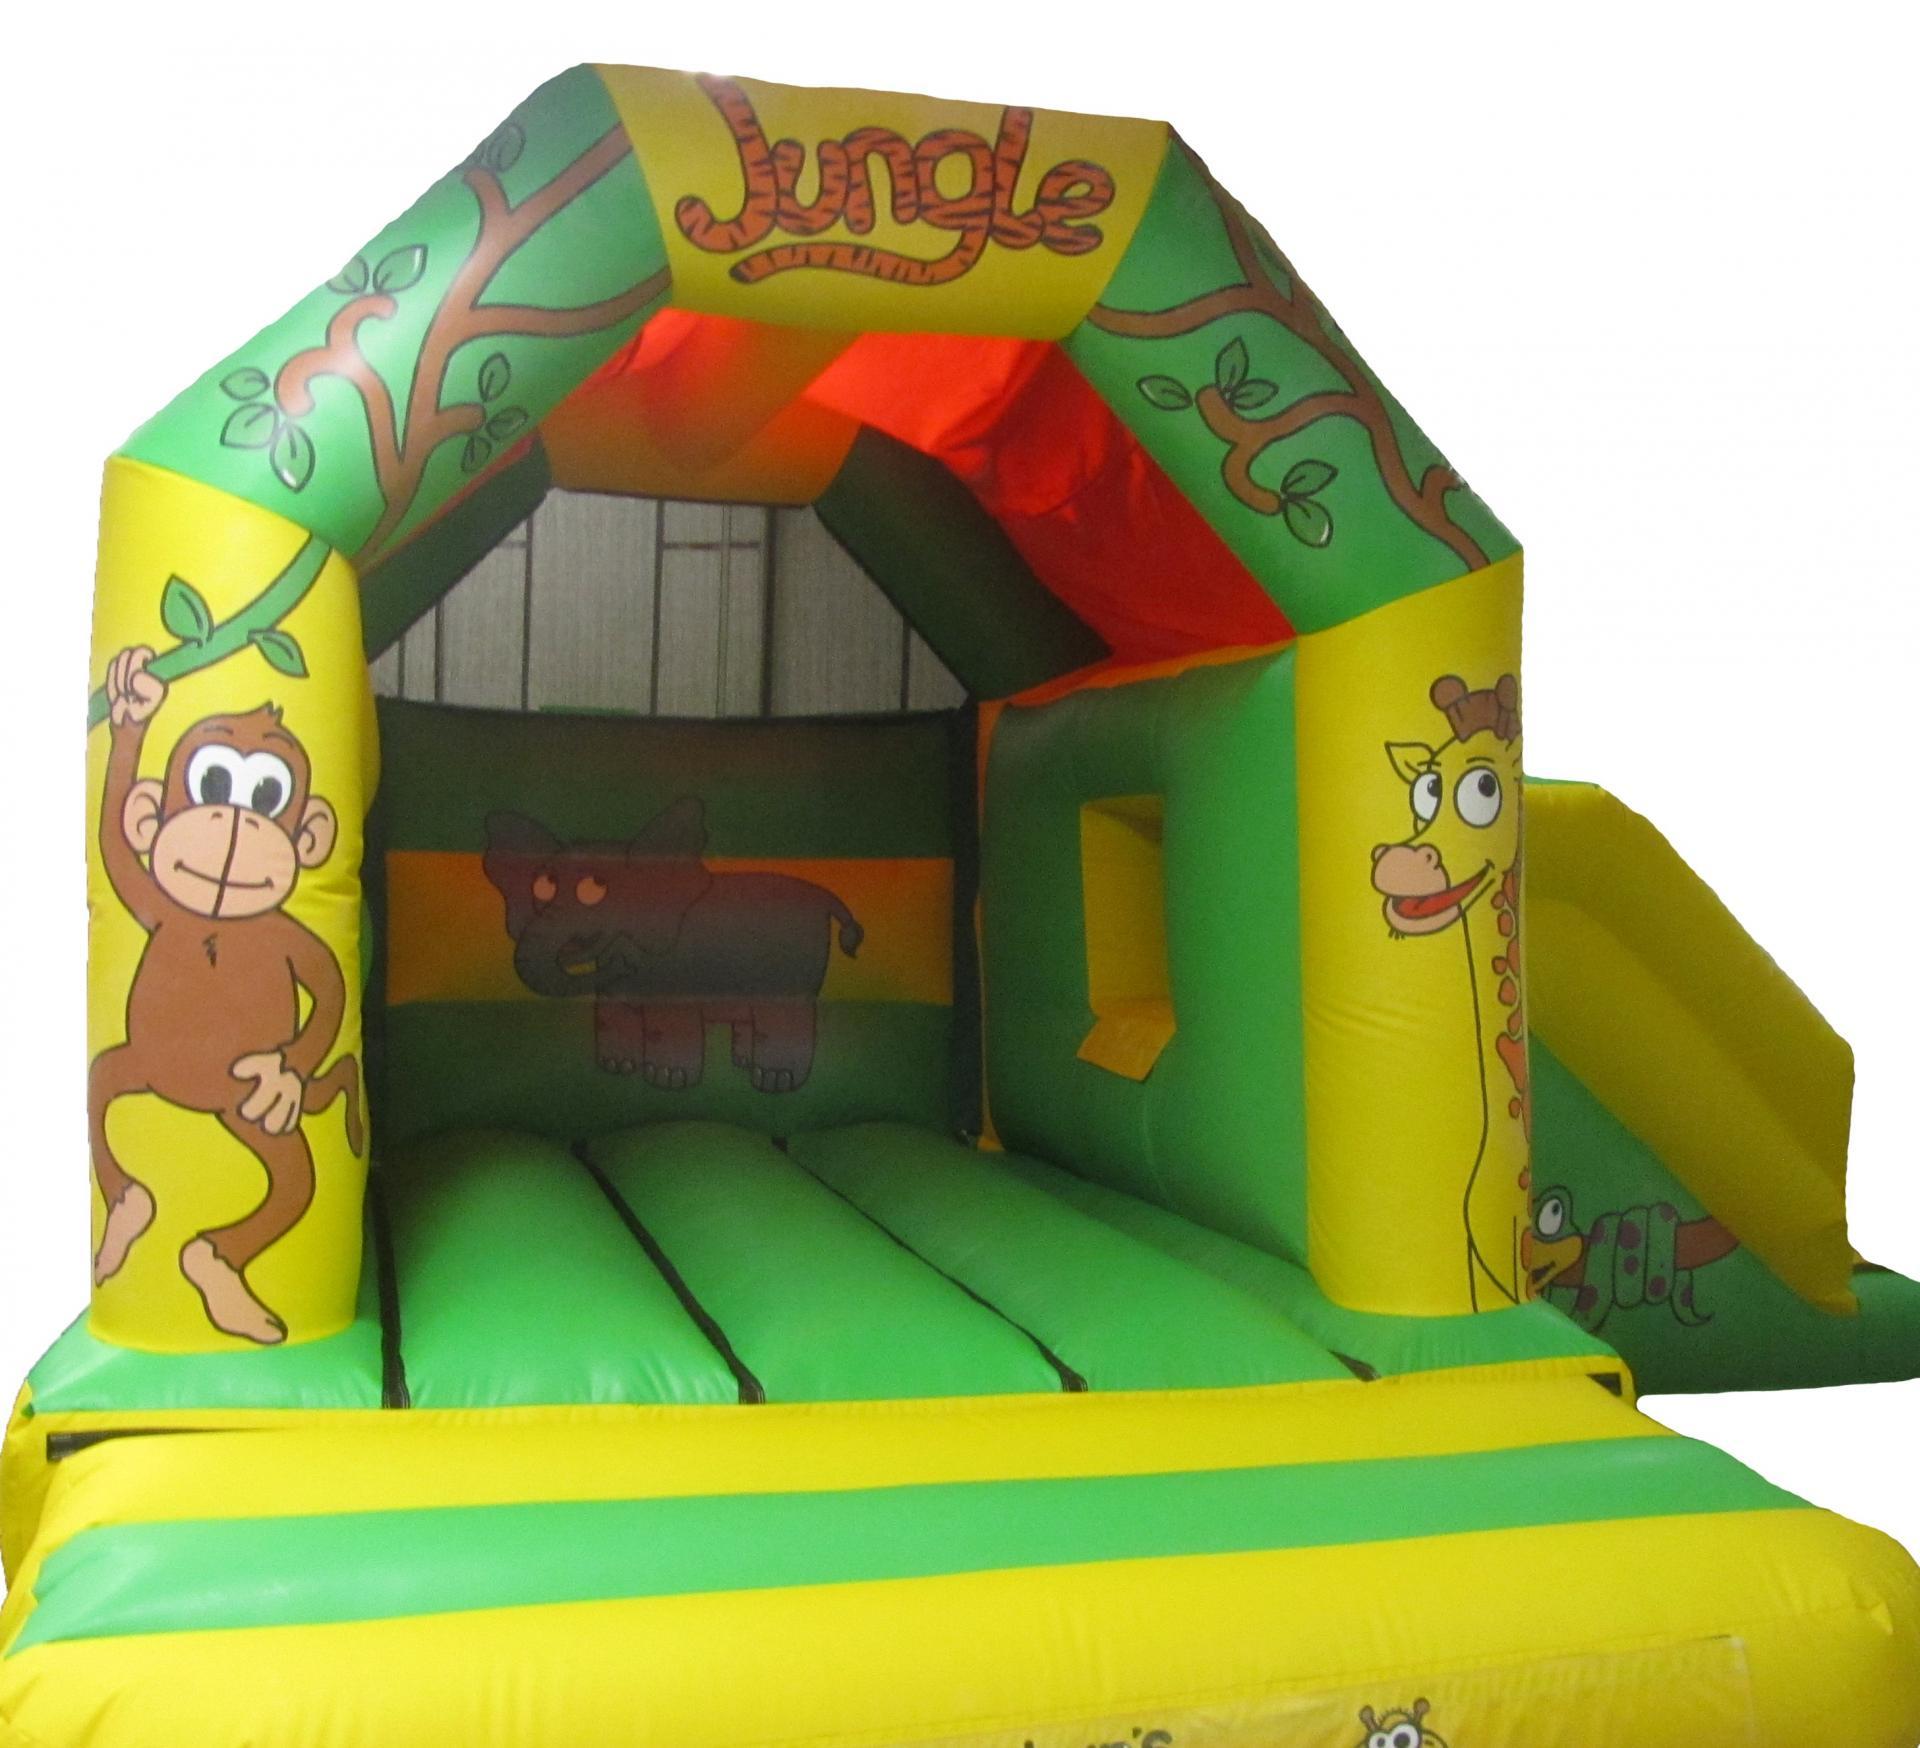 Jungle bouncer jumpingcastlecomboslide forsale